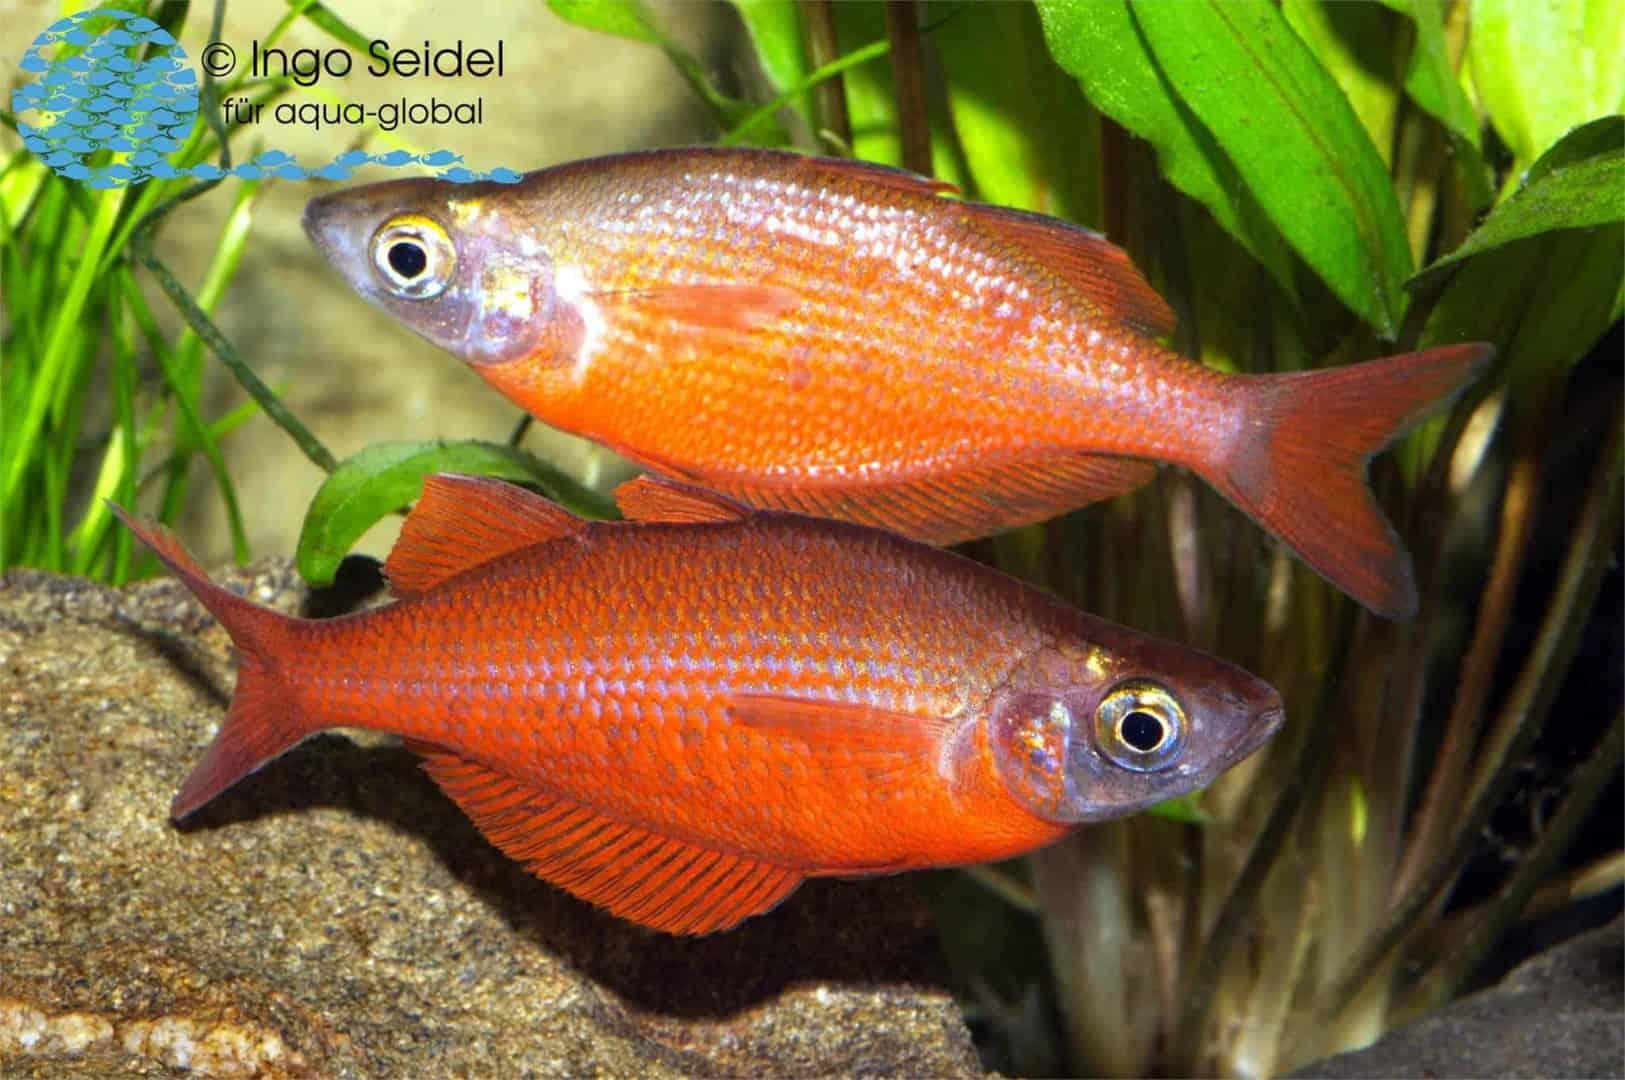 Tami-Regenbogenfisch – Glossolepis pseudoincisus